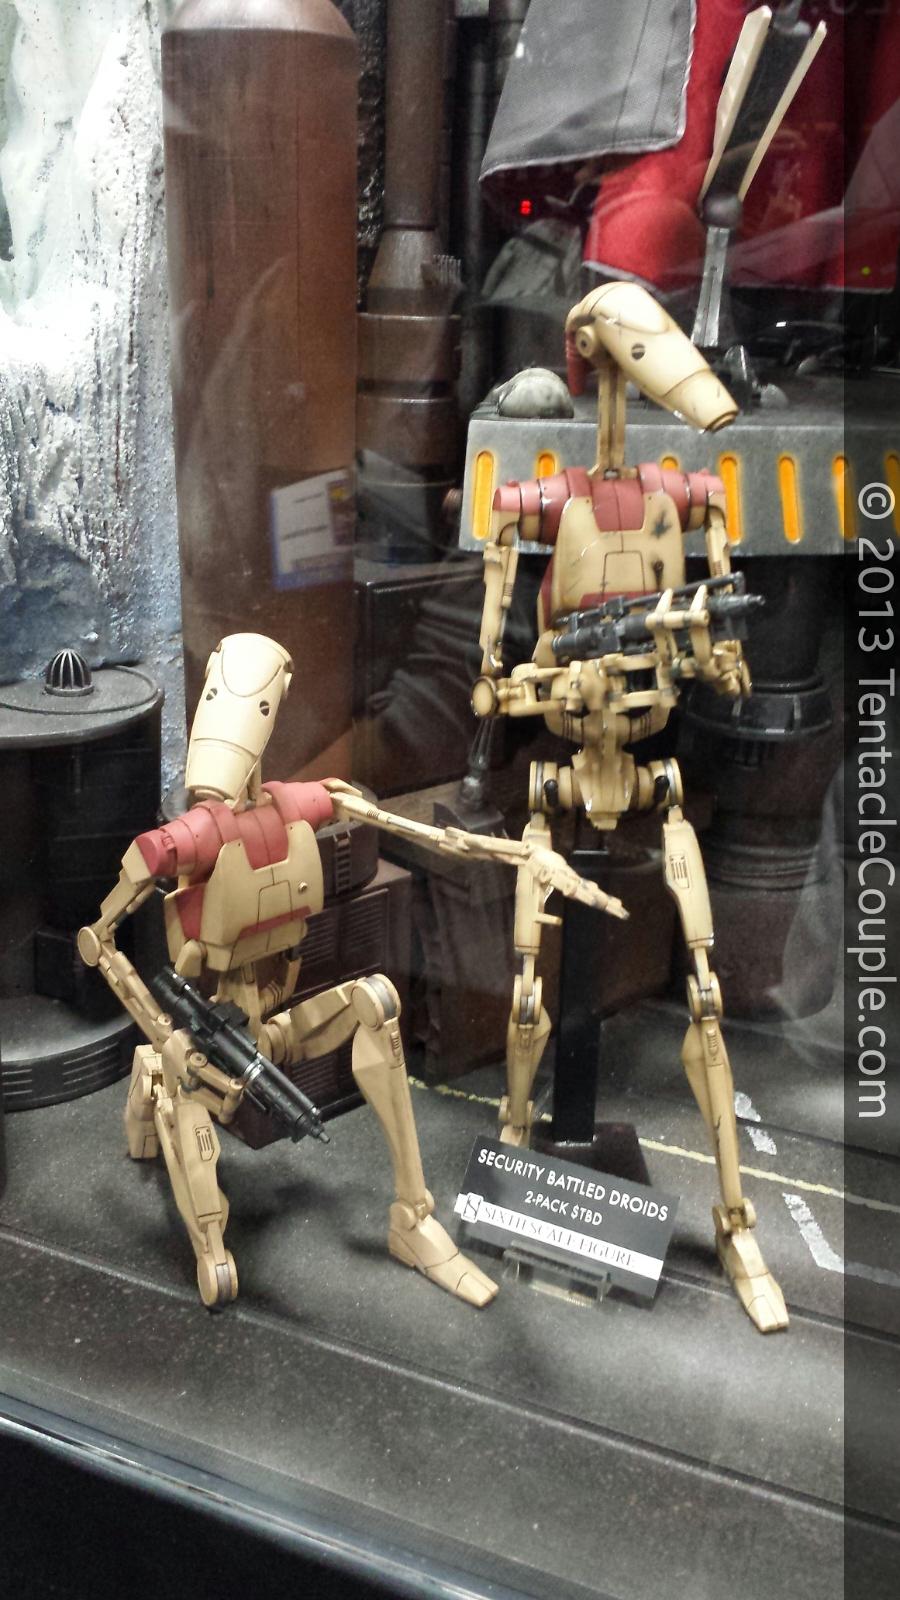 San Diego Comic-Con 2013 - Star Wars Driods